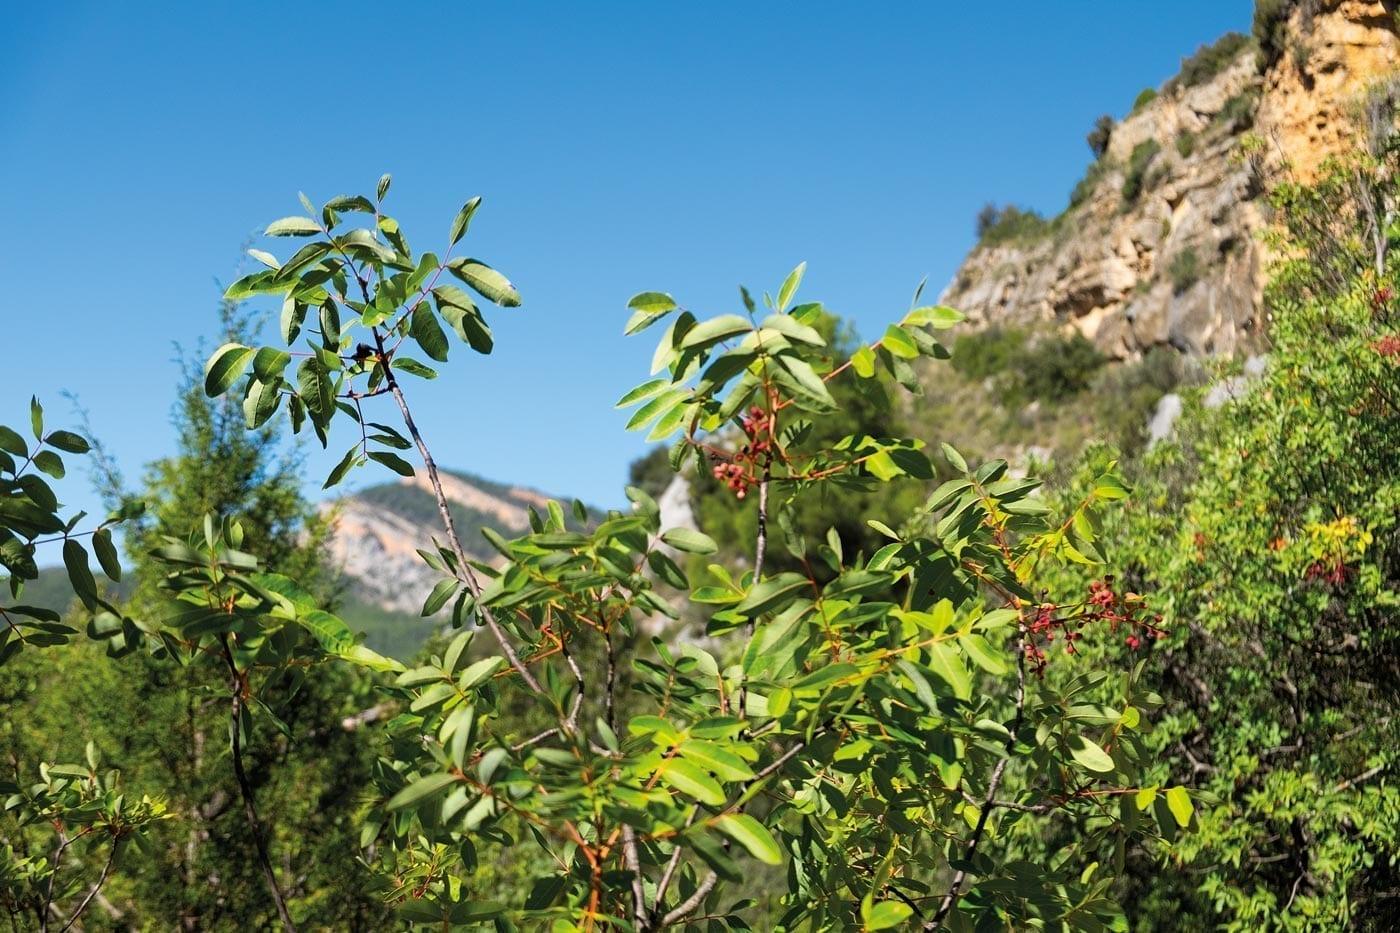 Naturpur, Wanderlust, Natur, Schluchtenwanderung, Wandern im Congost de Montrebei